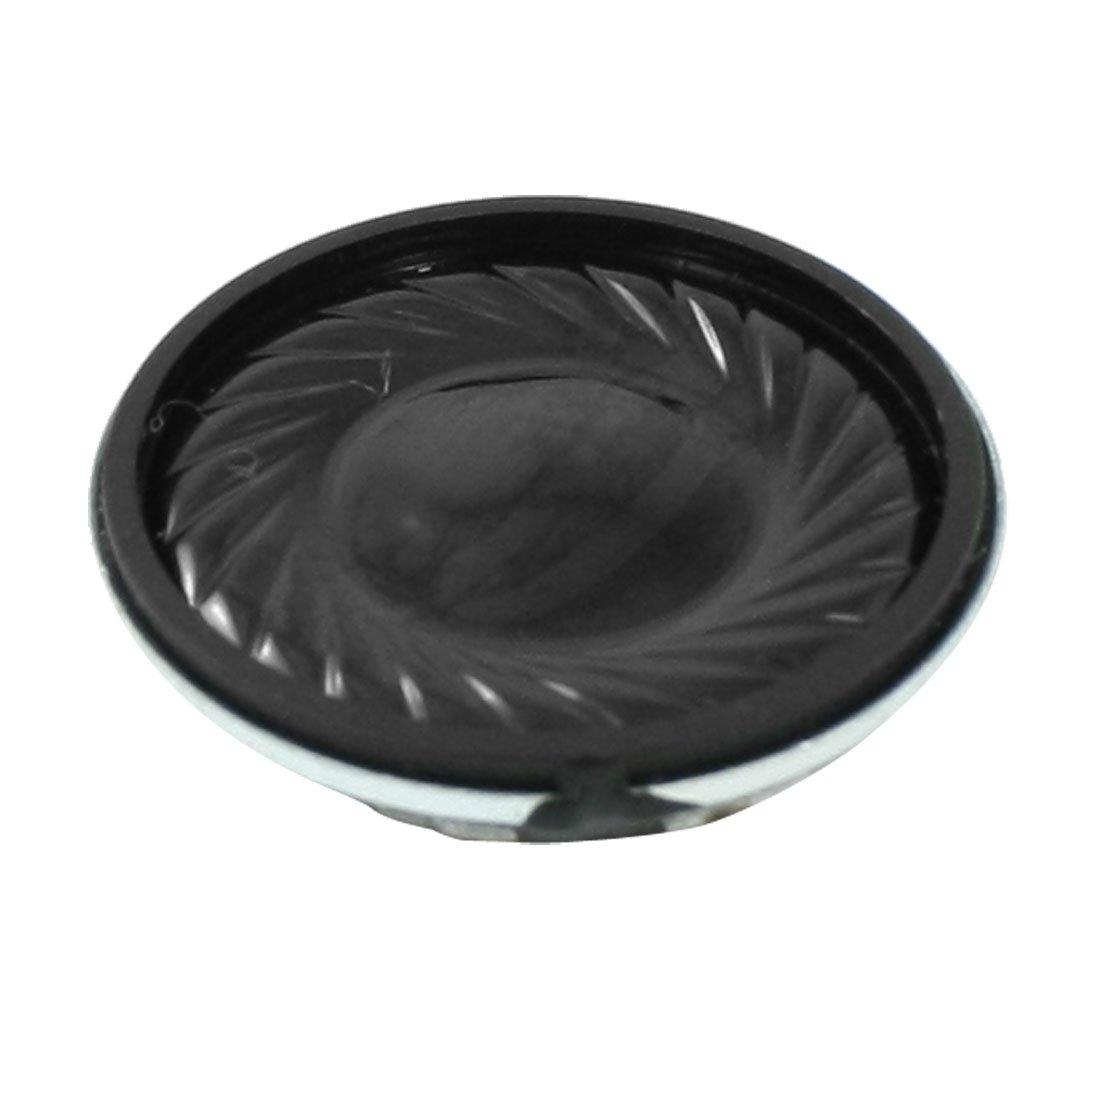 uxcell 1 Watt 8 Ohm 28mm Dia Magnetic Type Aluminum Round Speaker Silver Tone Black